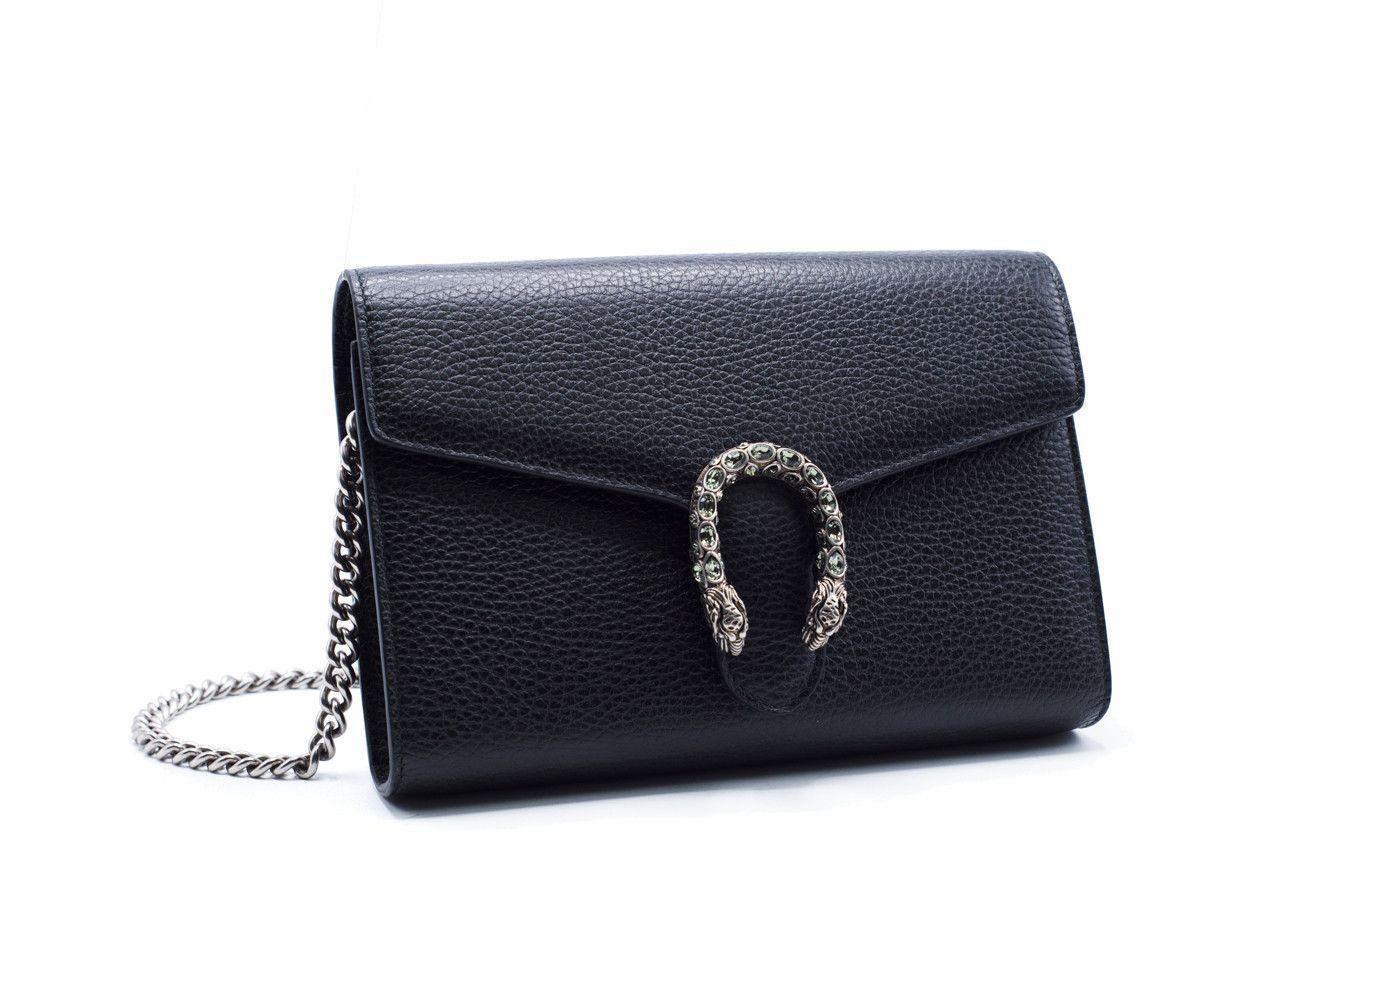 60623bdec Gucci Women's Black Dionysus Leather Mini Chain Shoulder Bag ...